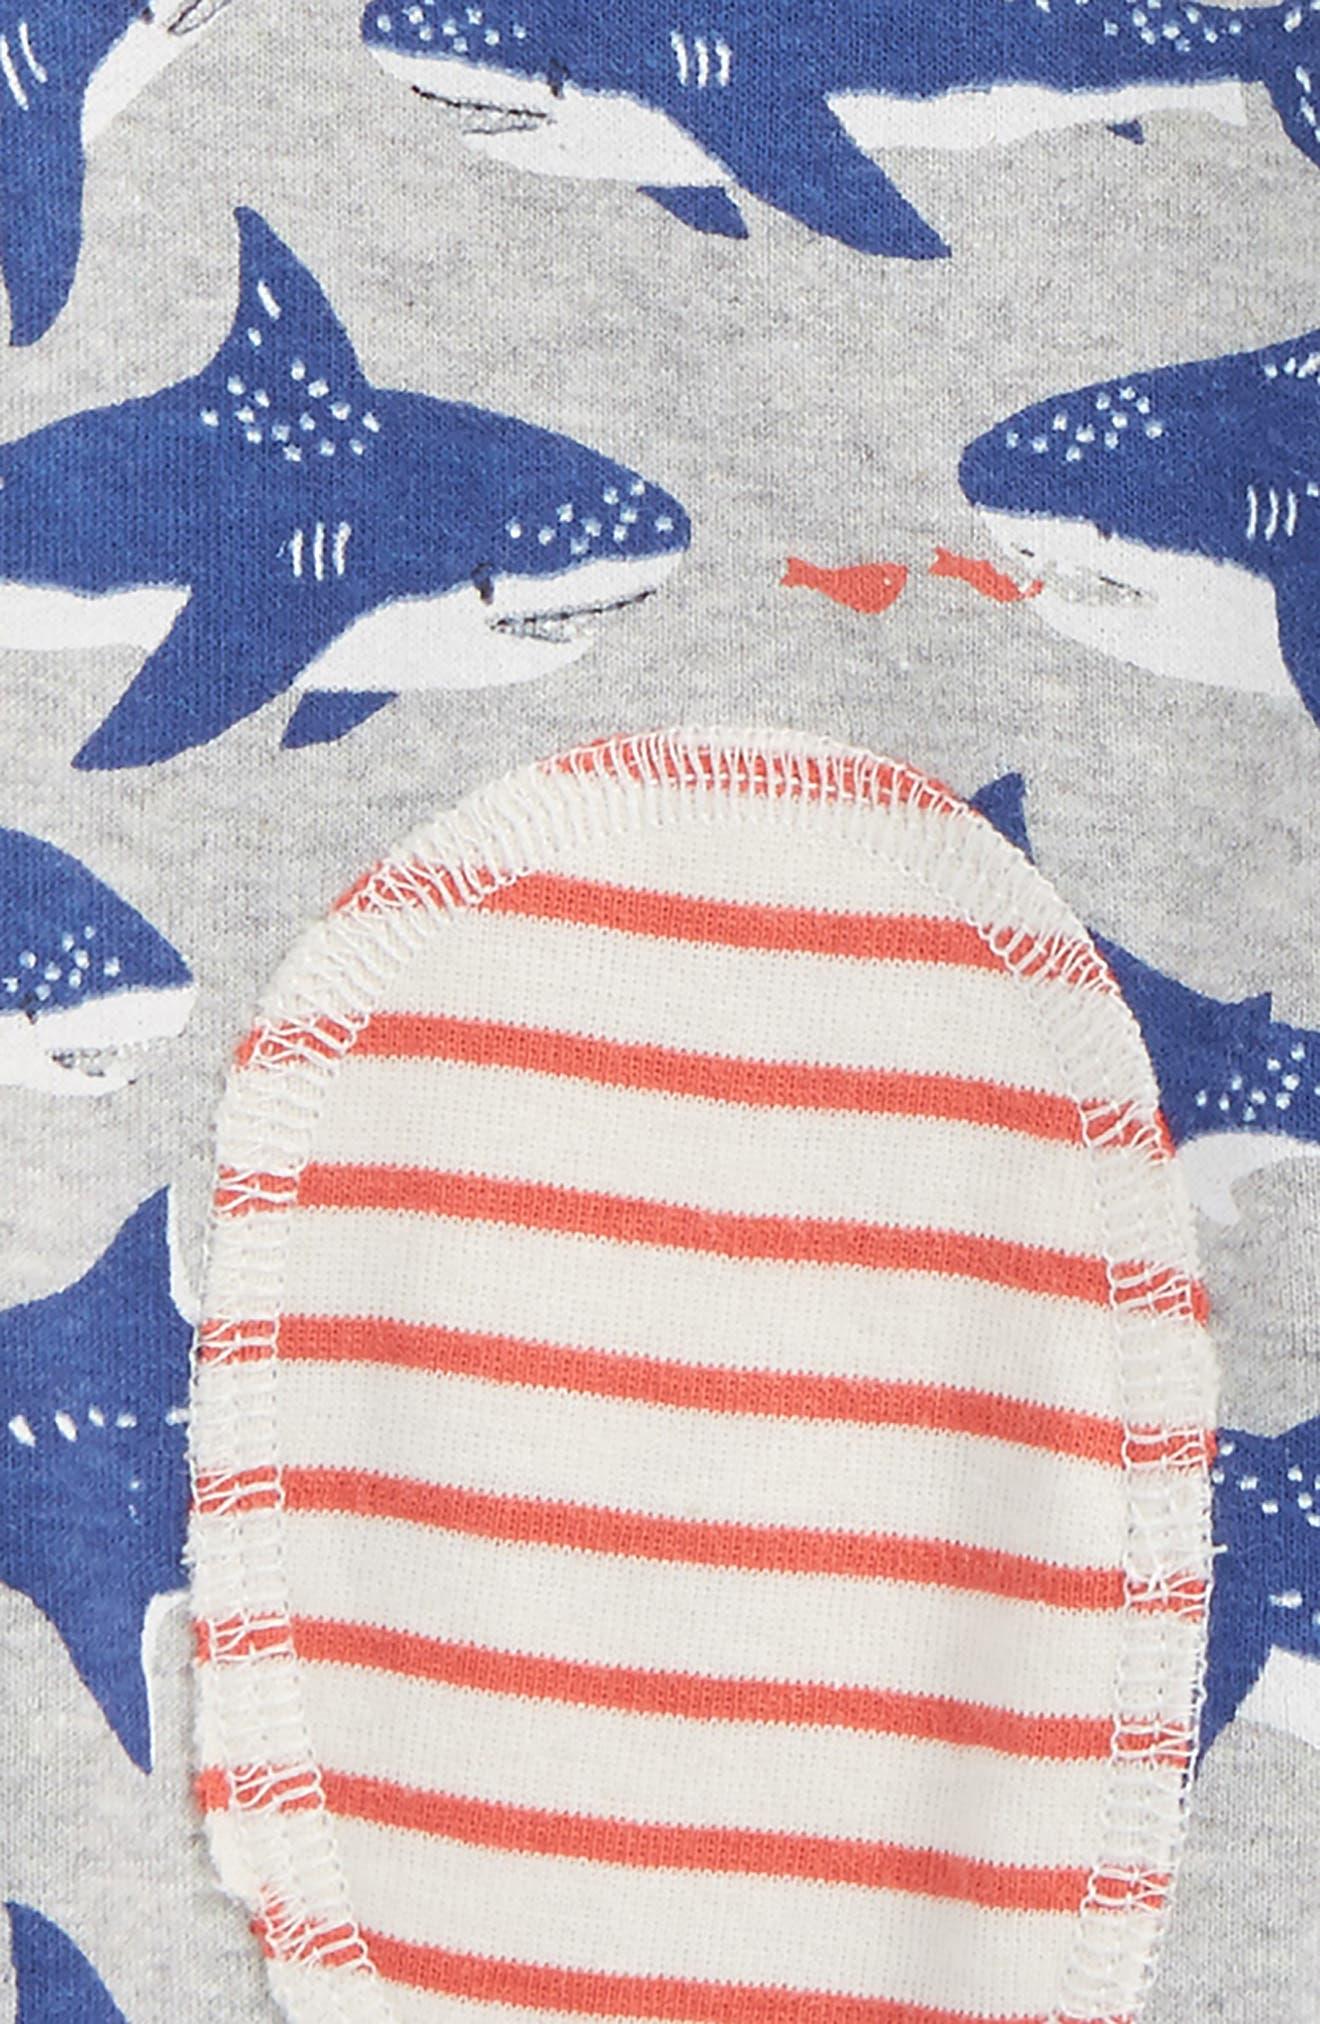 Reversible Knee Patch Pants,                             Alternate thumbnail 3, color,                             Grey Marl Sharks